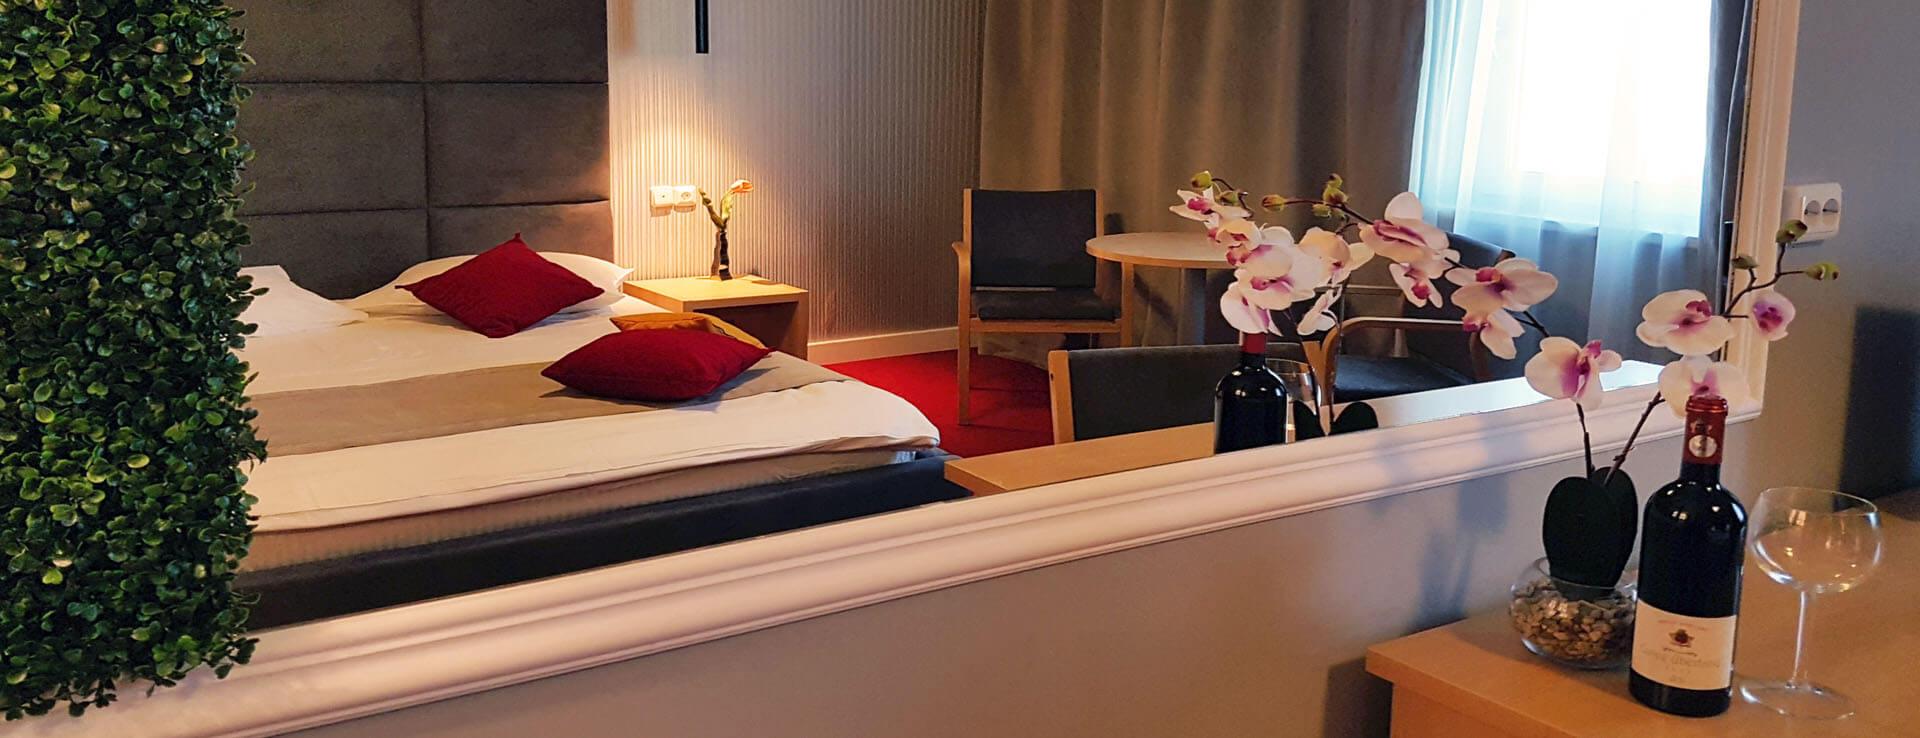 Camera Dublă Hotel Boavista